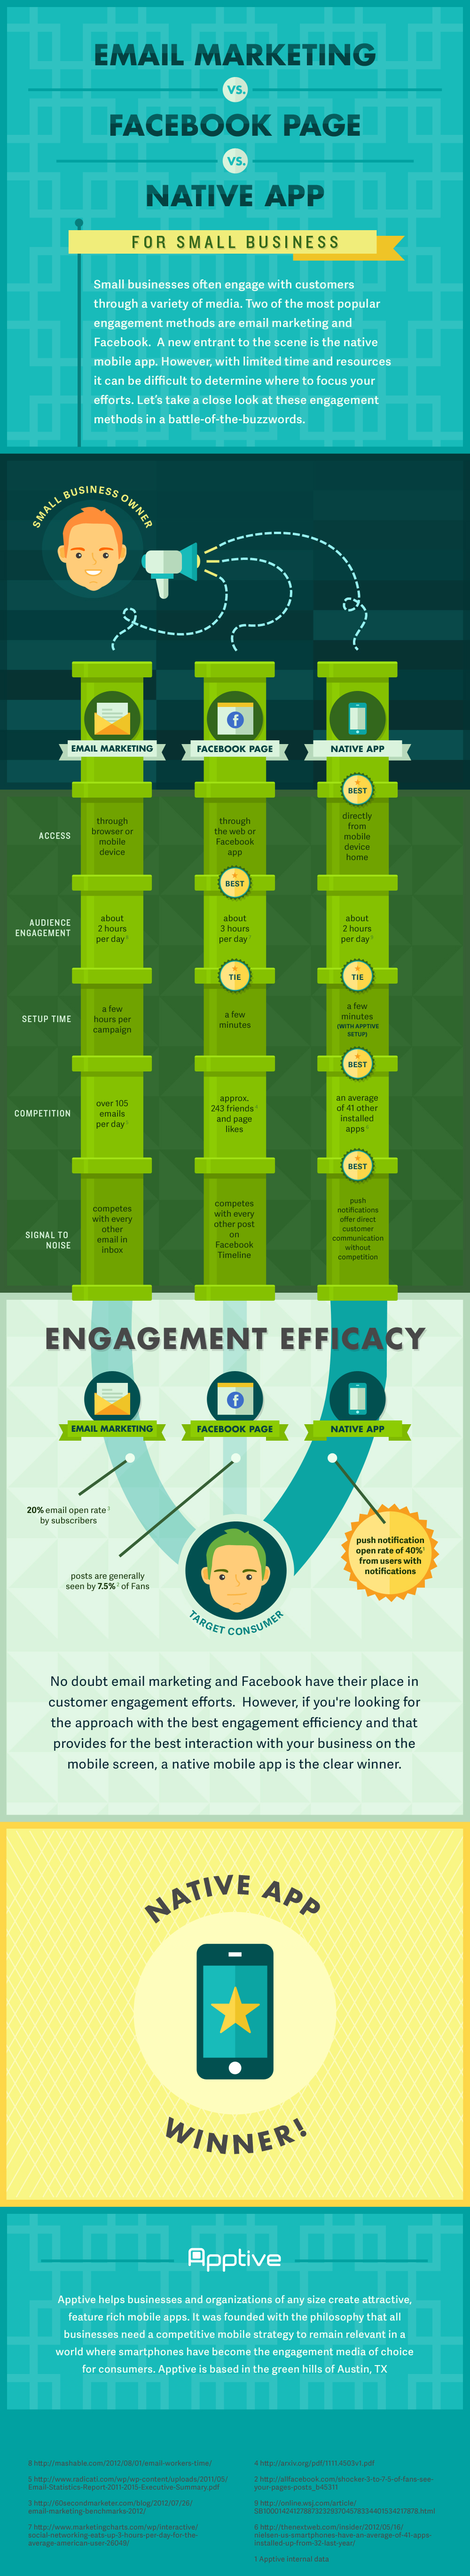 email-marketing-vs-facebook-page-vs-native-app_51891f998c14c